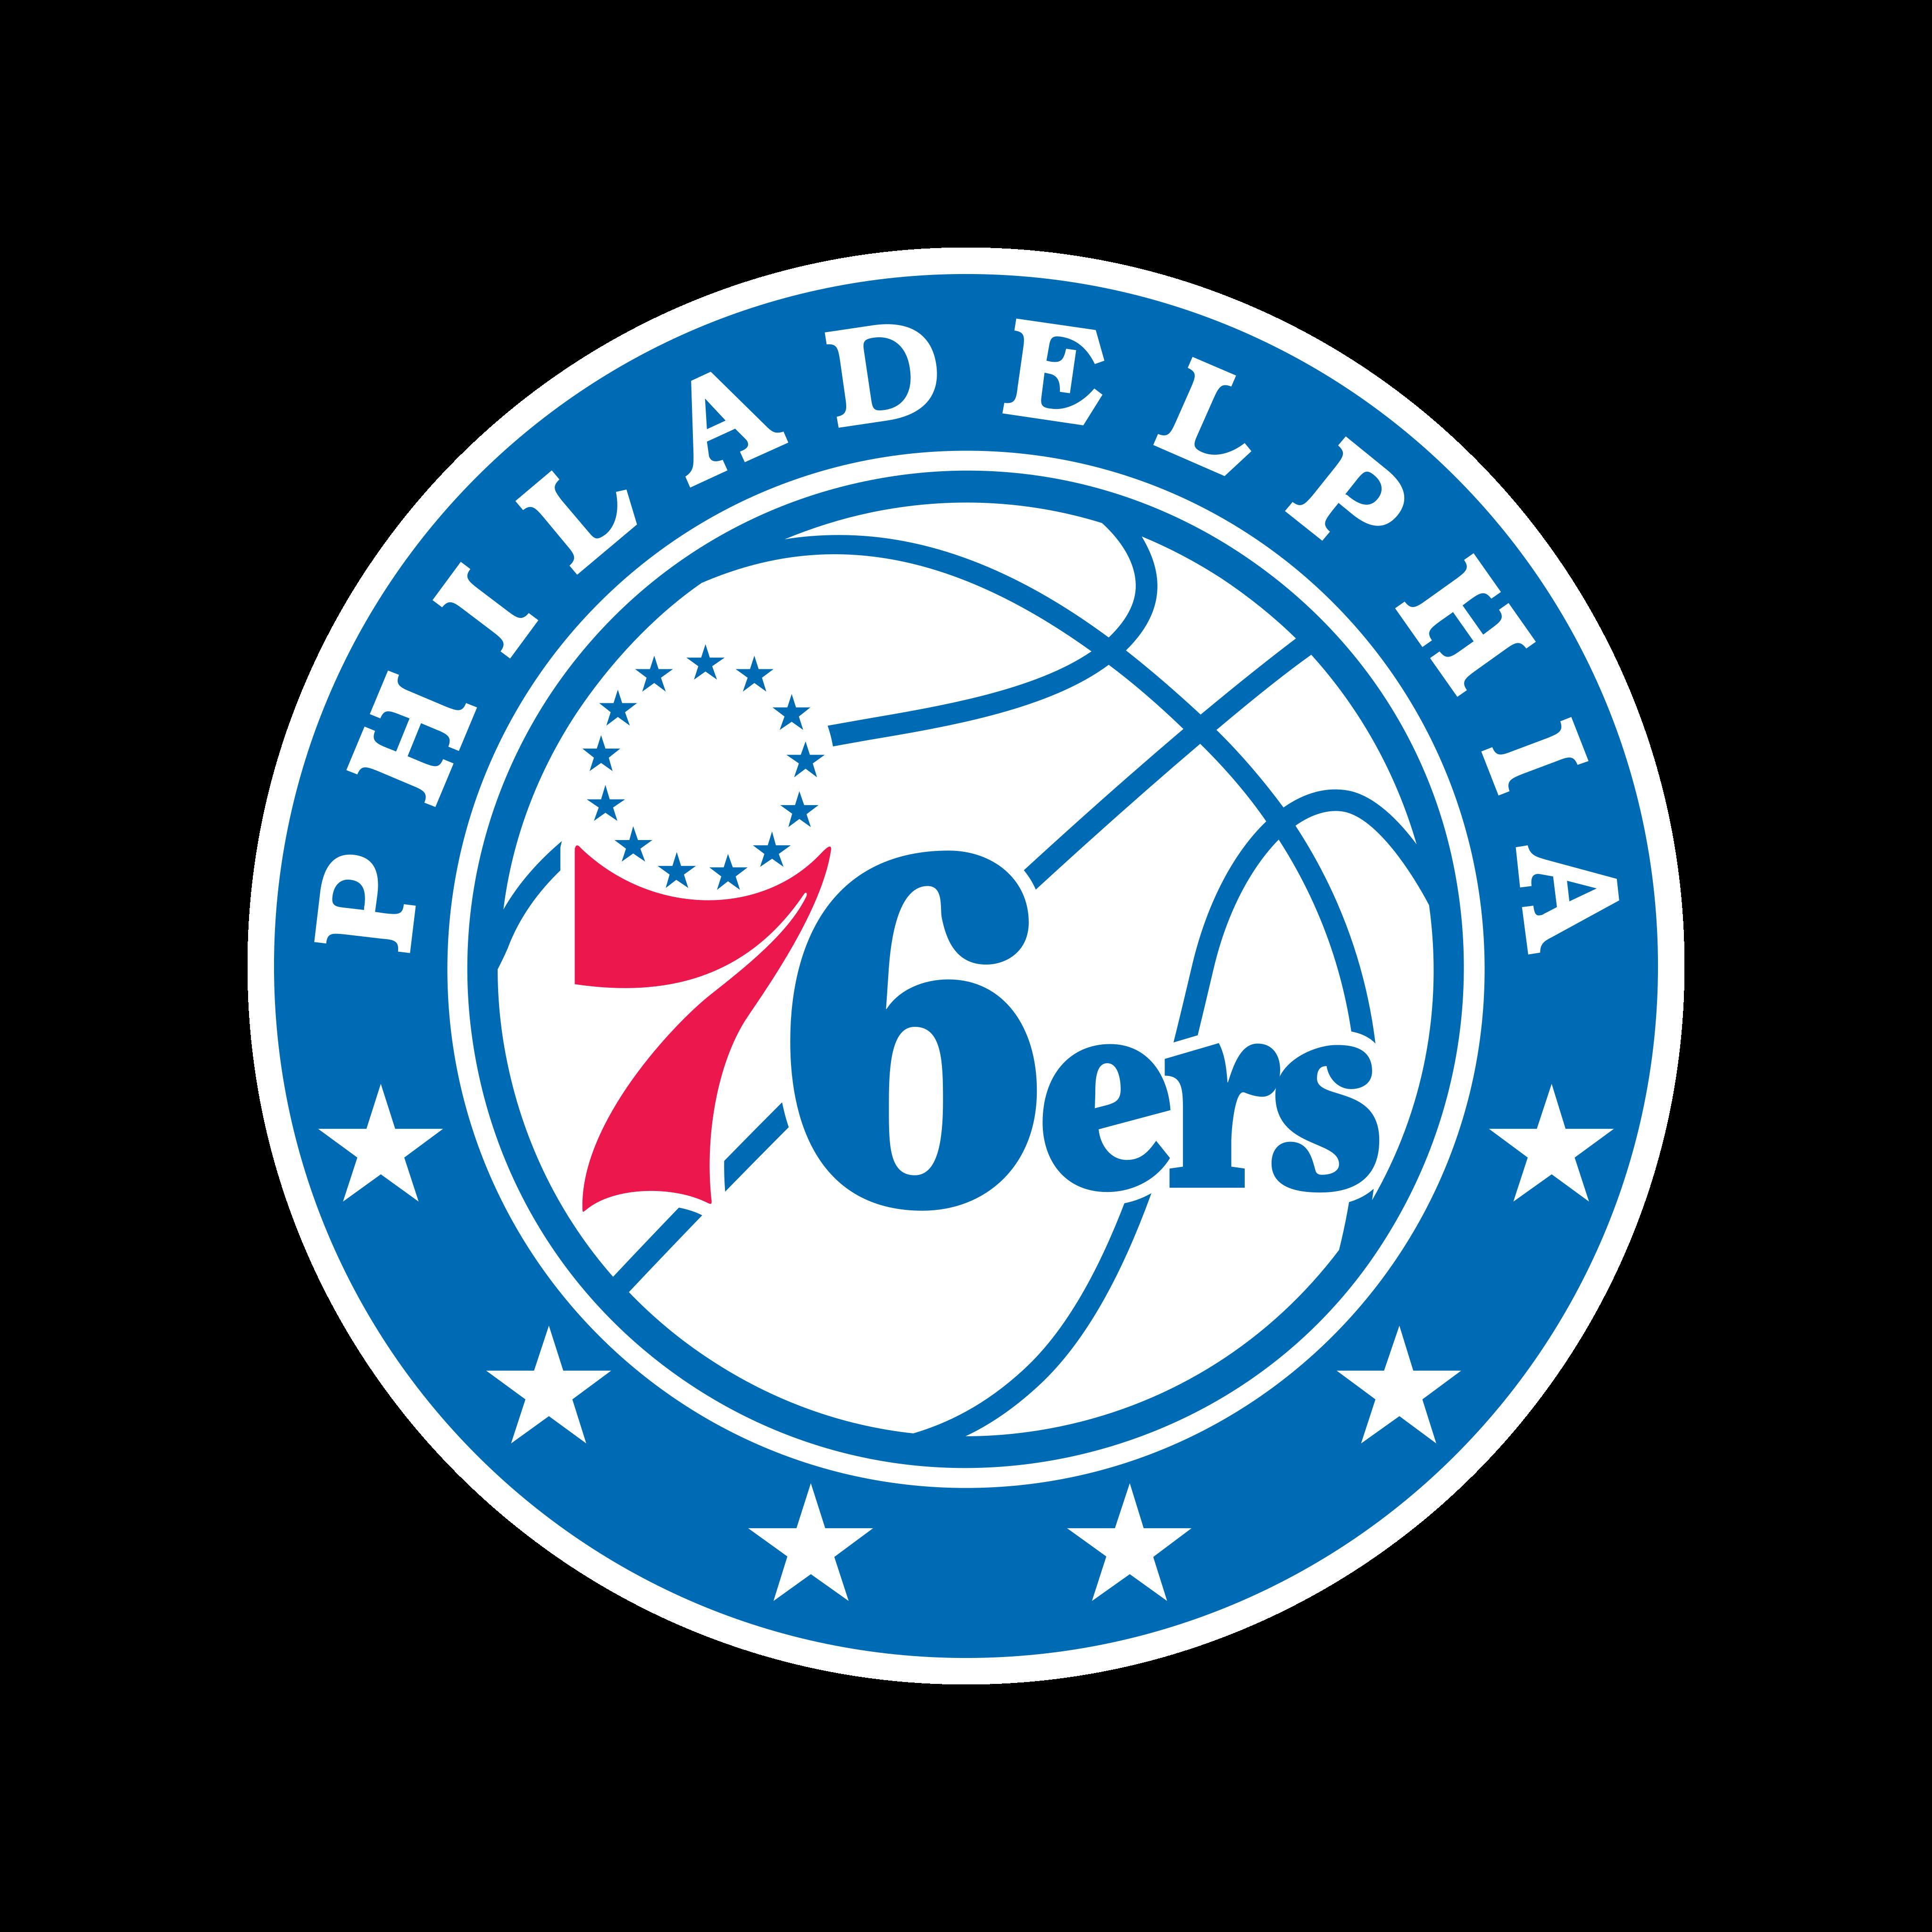 philadelphia 76ers logo 0 - Philadelphia 76ers Logo